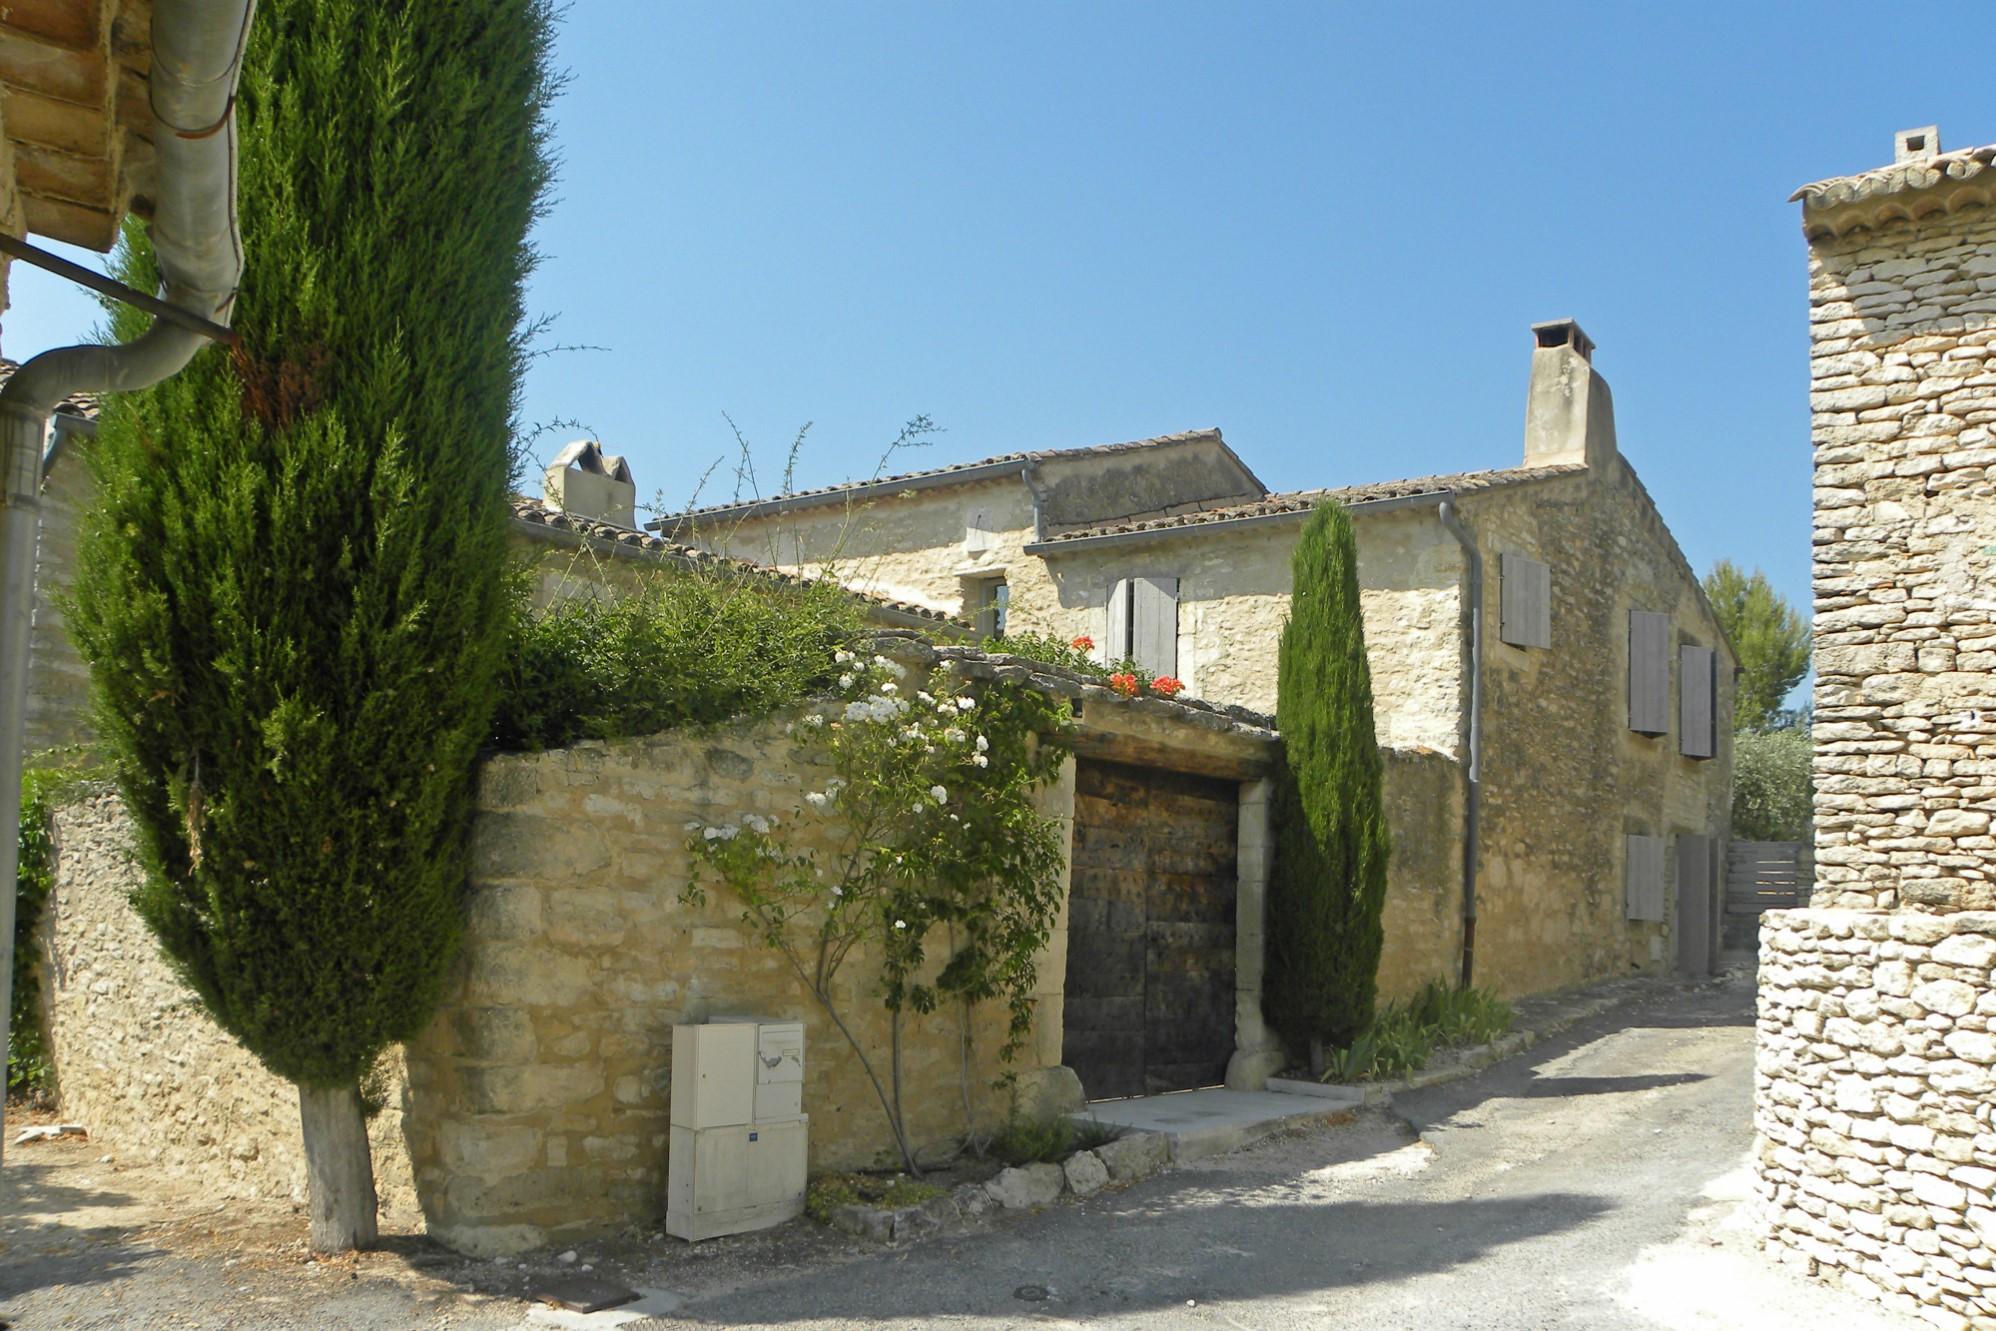 Maison de hameau rénovée avec goût